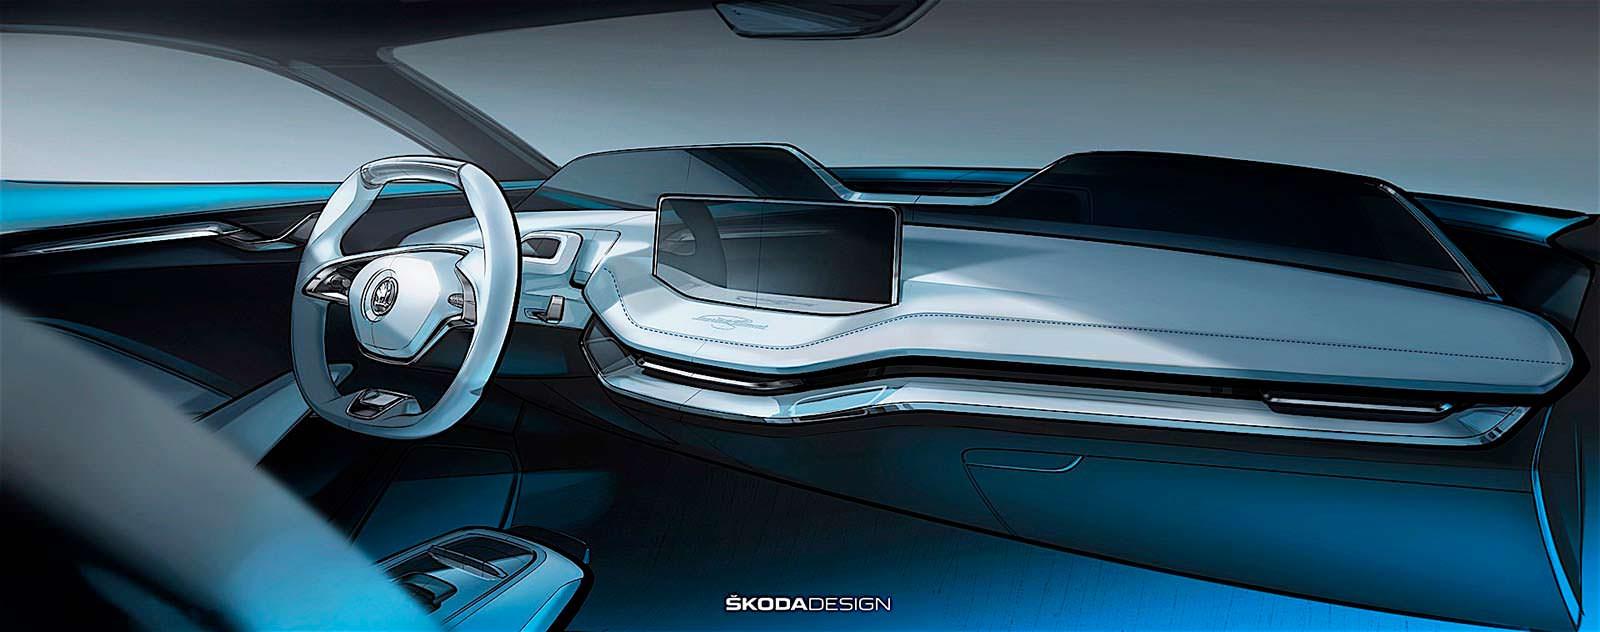 Фото | Салон Skoda VisionE с цифровыми экранами